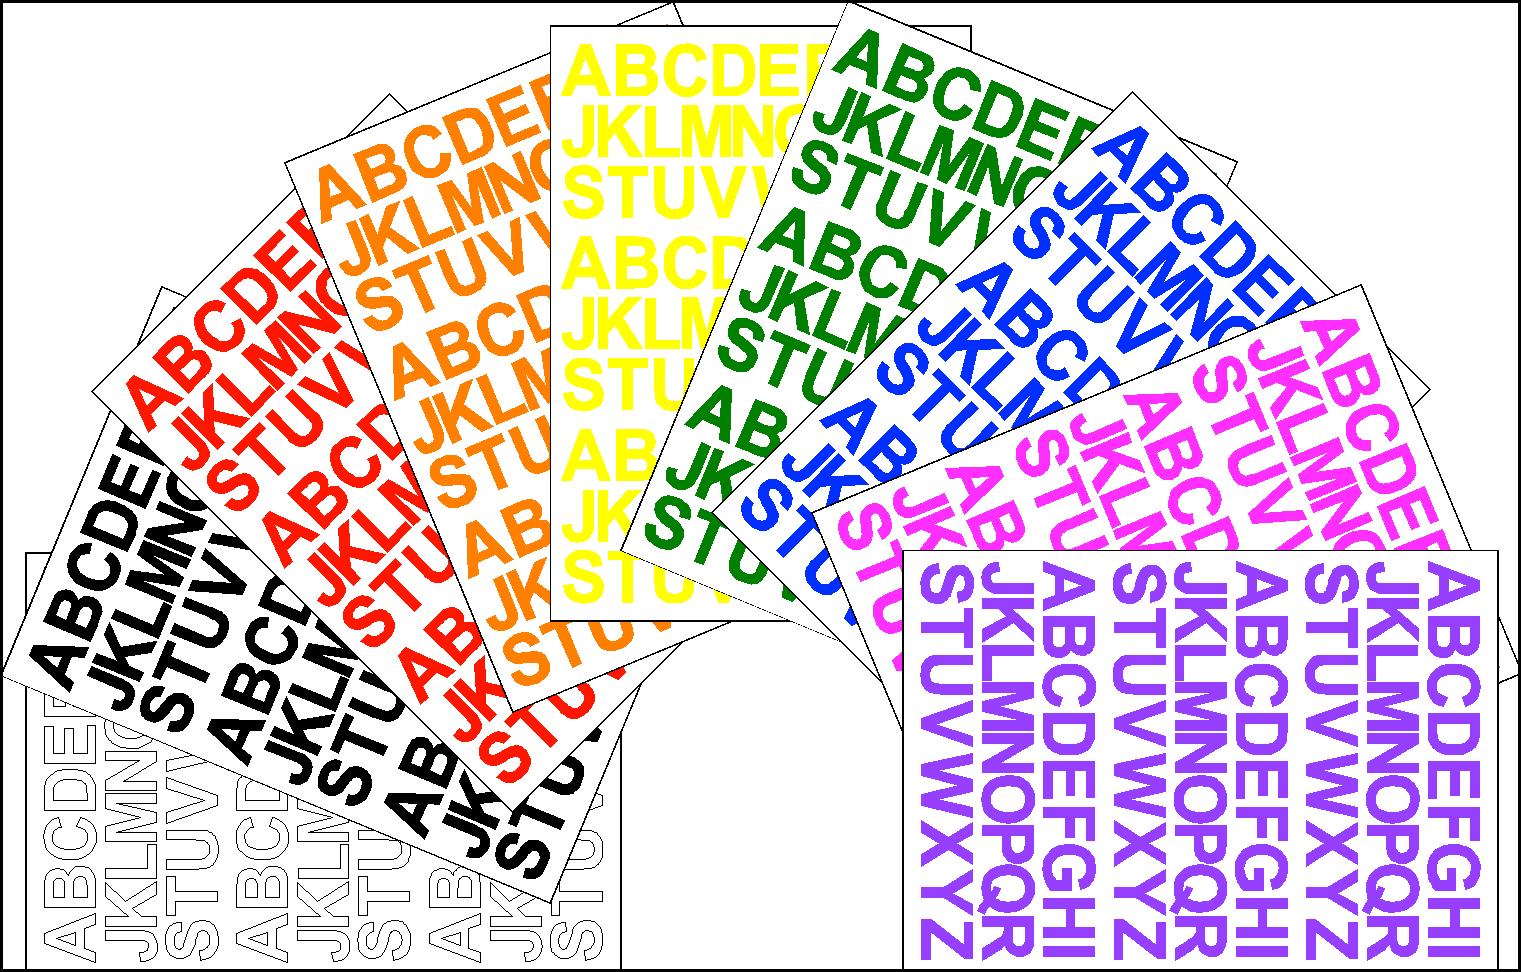 Alphabet Stickers computer cut